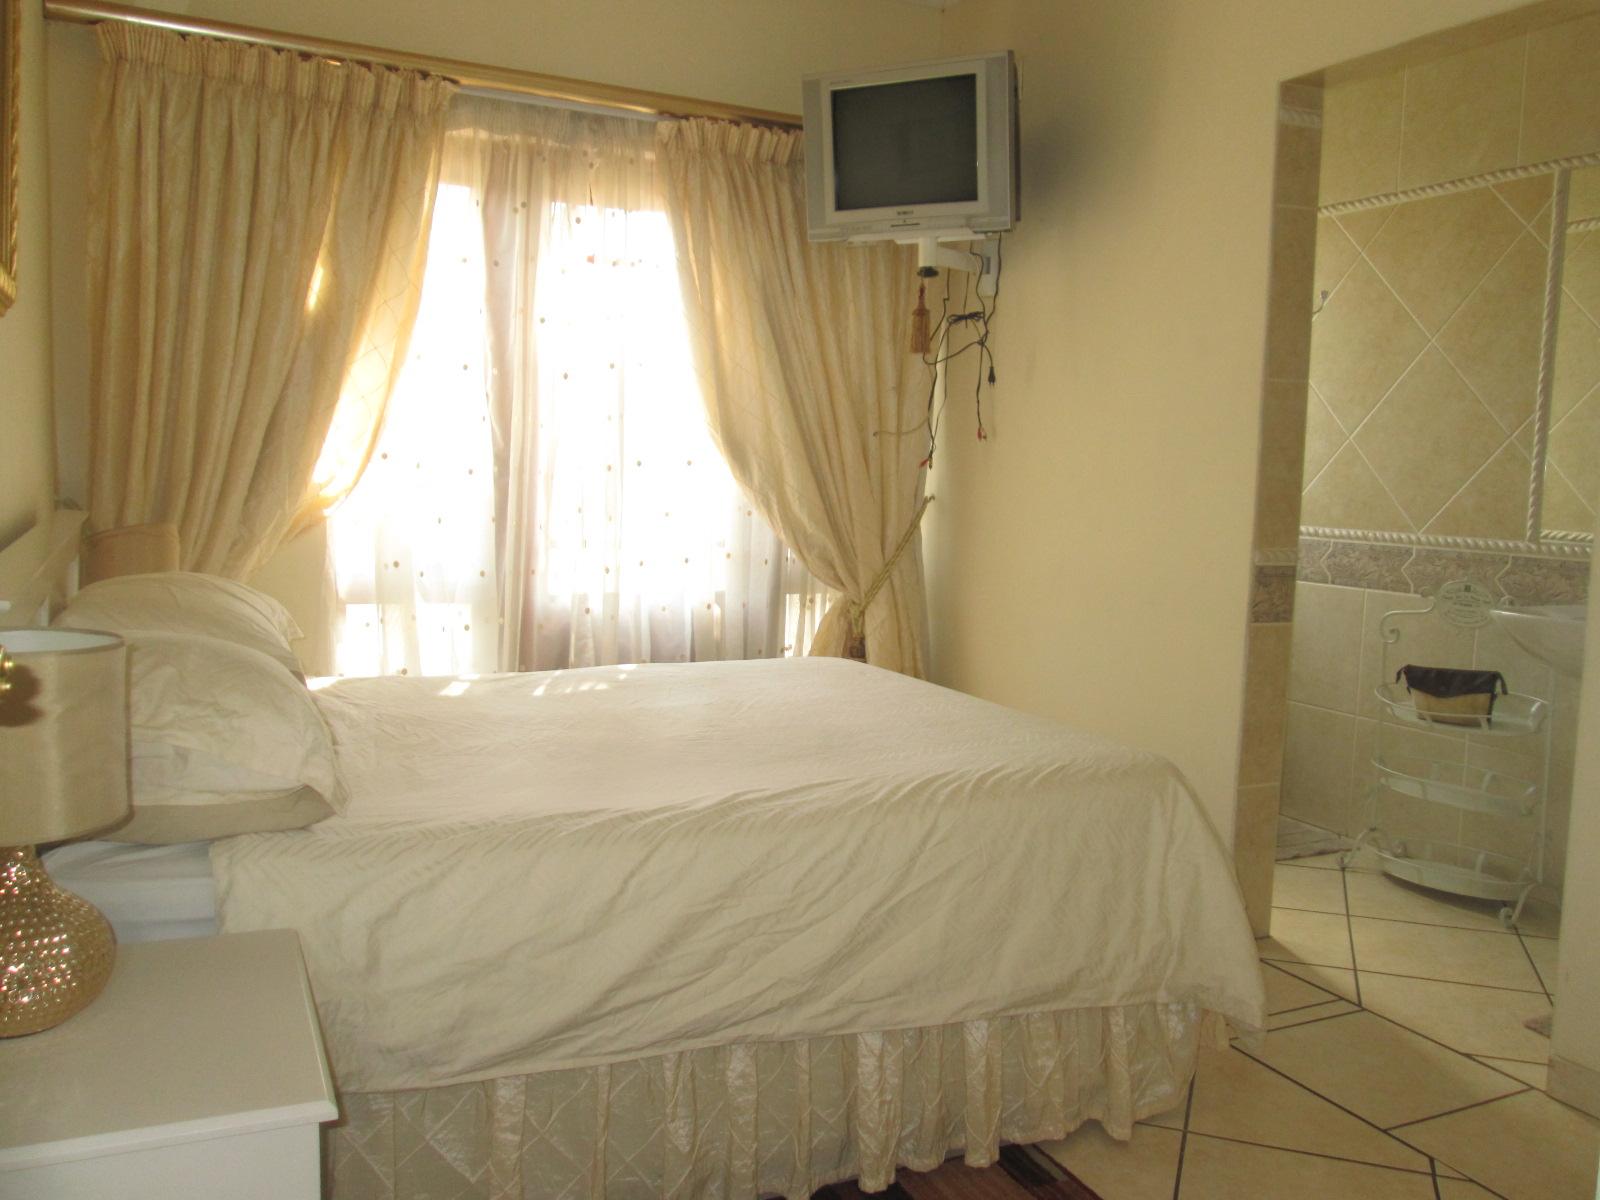 8 bedroom House for sale in Alberton